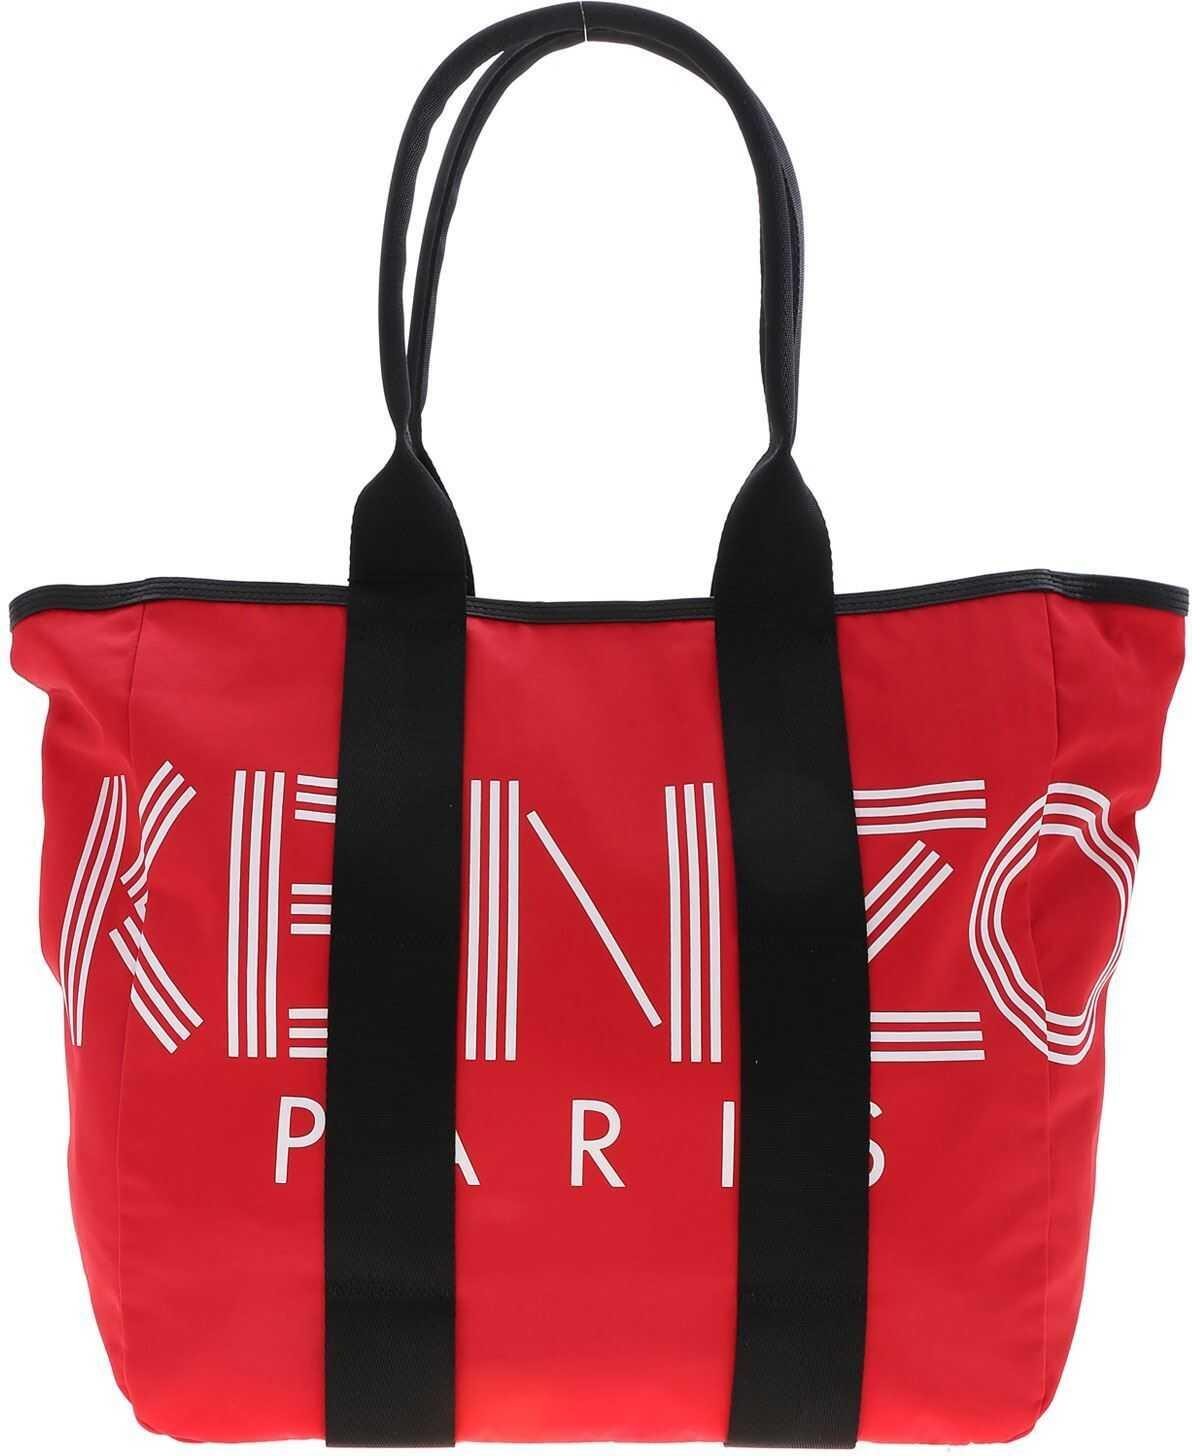 Kenzo Kenzo Paris Tote Bag In Red 5SF219 F24 21 Red imagine b-mall.ro